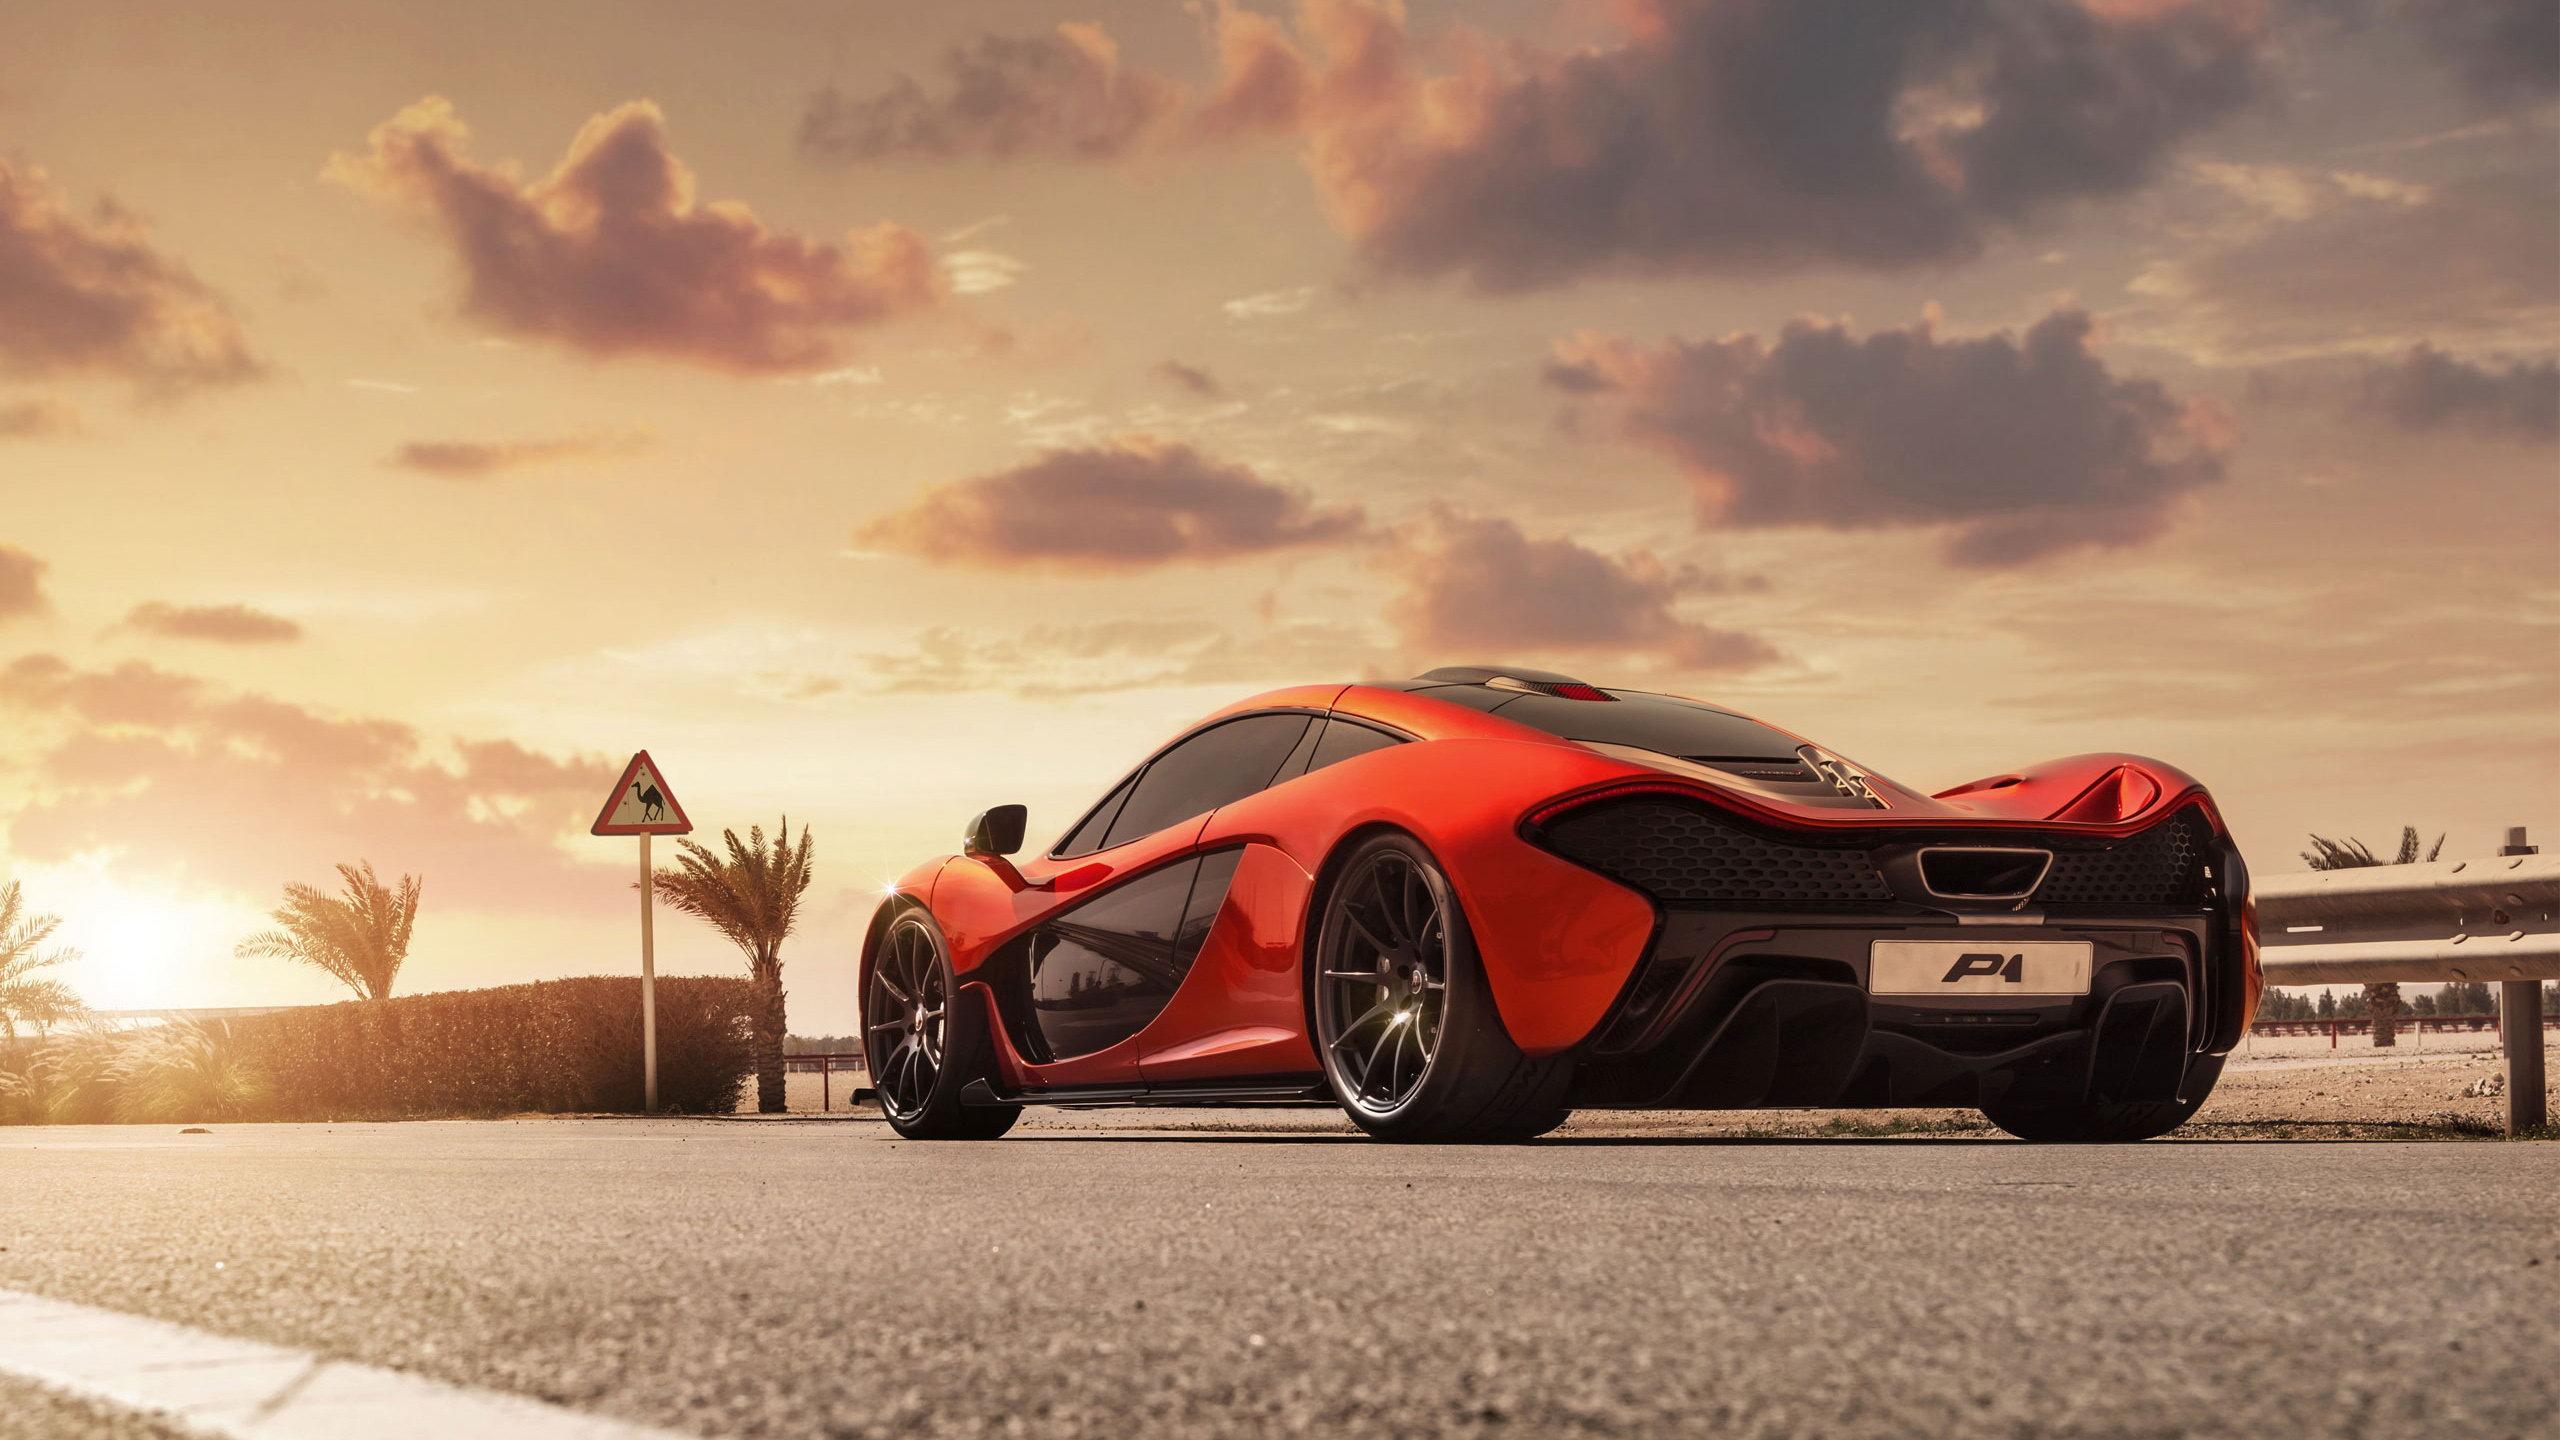 50 Super Sports Car Wallpapers Thatll Blow Your Desktop Away 2560x1440